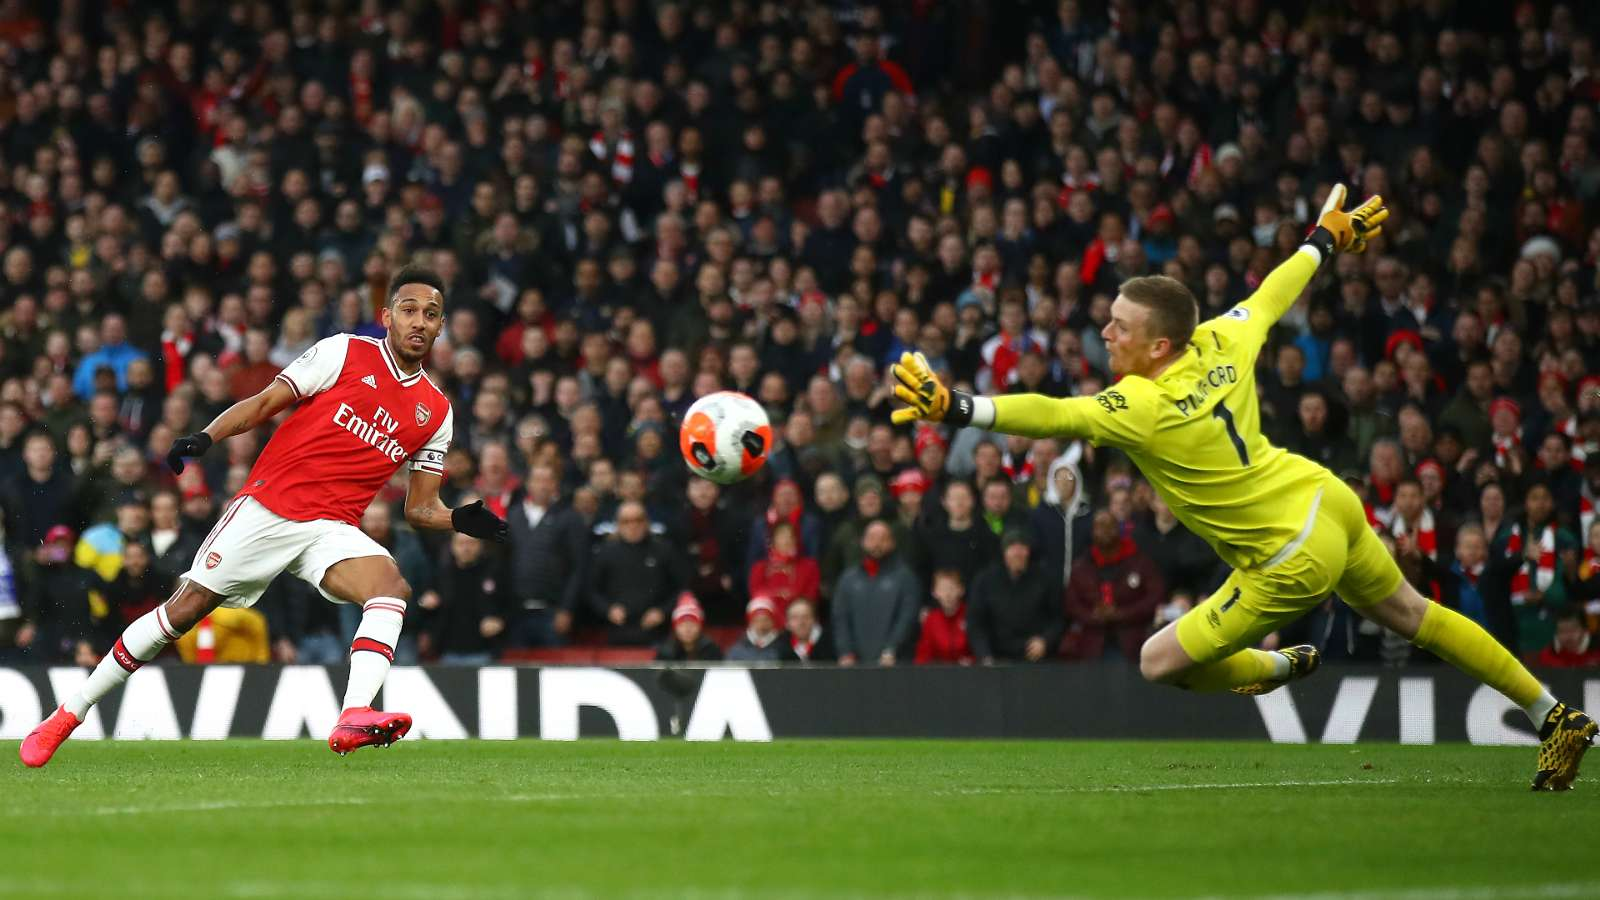 Arsenal 3-2 Everton: Match Report 23 Feb 2020